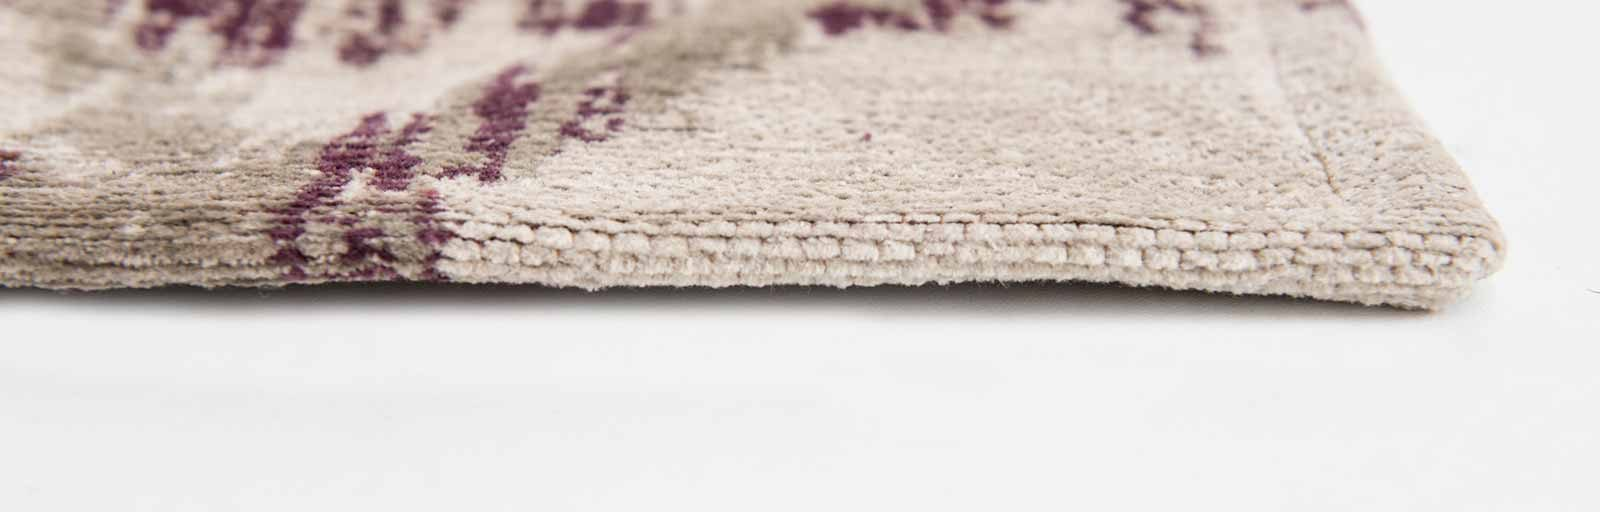 Louis De Poortere rugs Villa Nova LX 8752 Sudare Jewel side